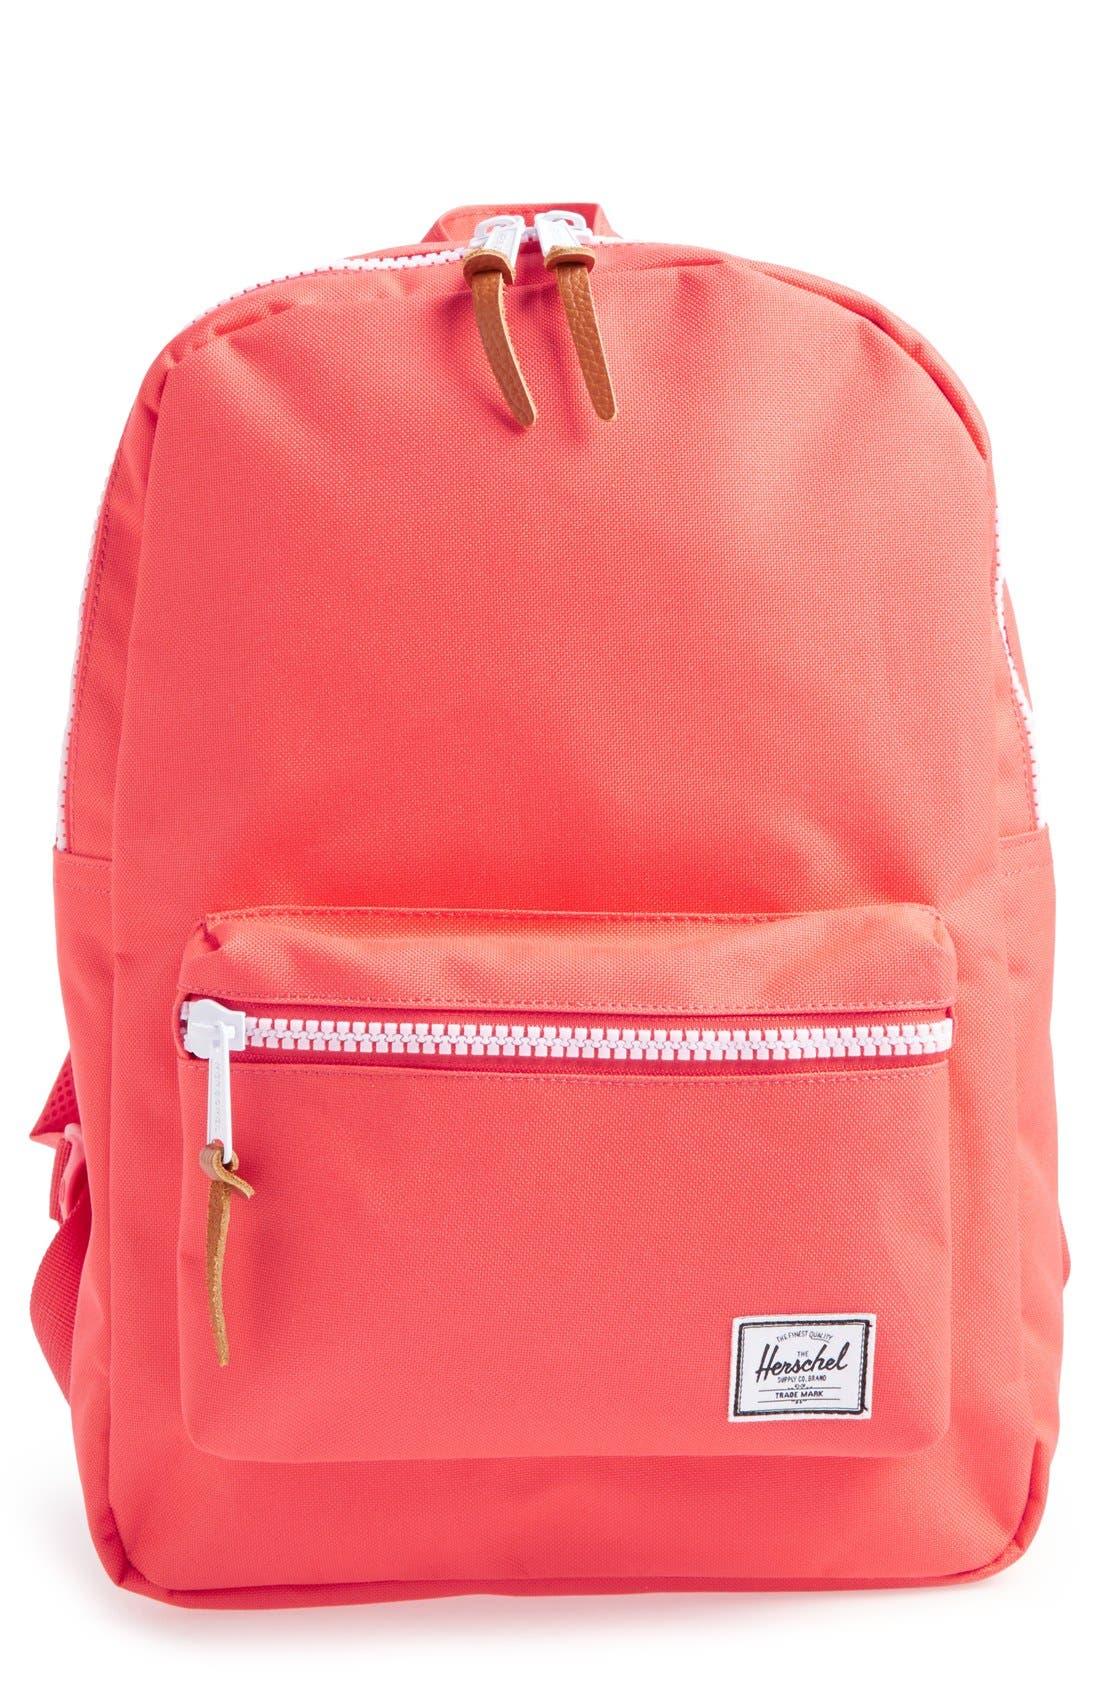 Alternate Image 1 Selected - Herschel Supply Co. 'Settlement' Backpack (Kids)